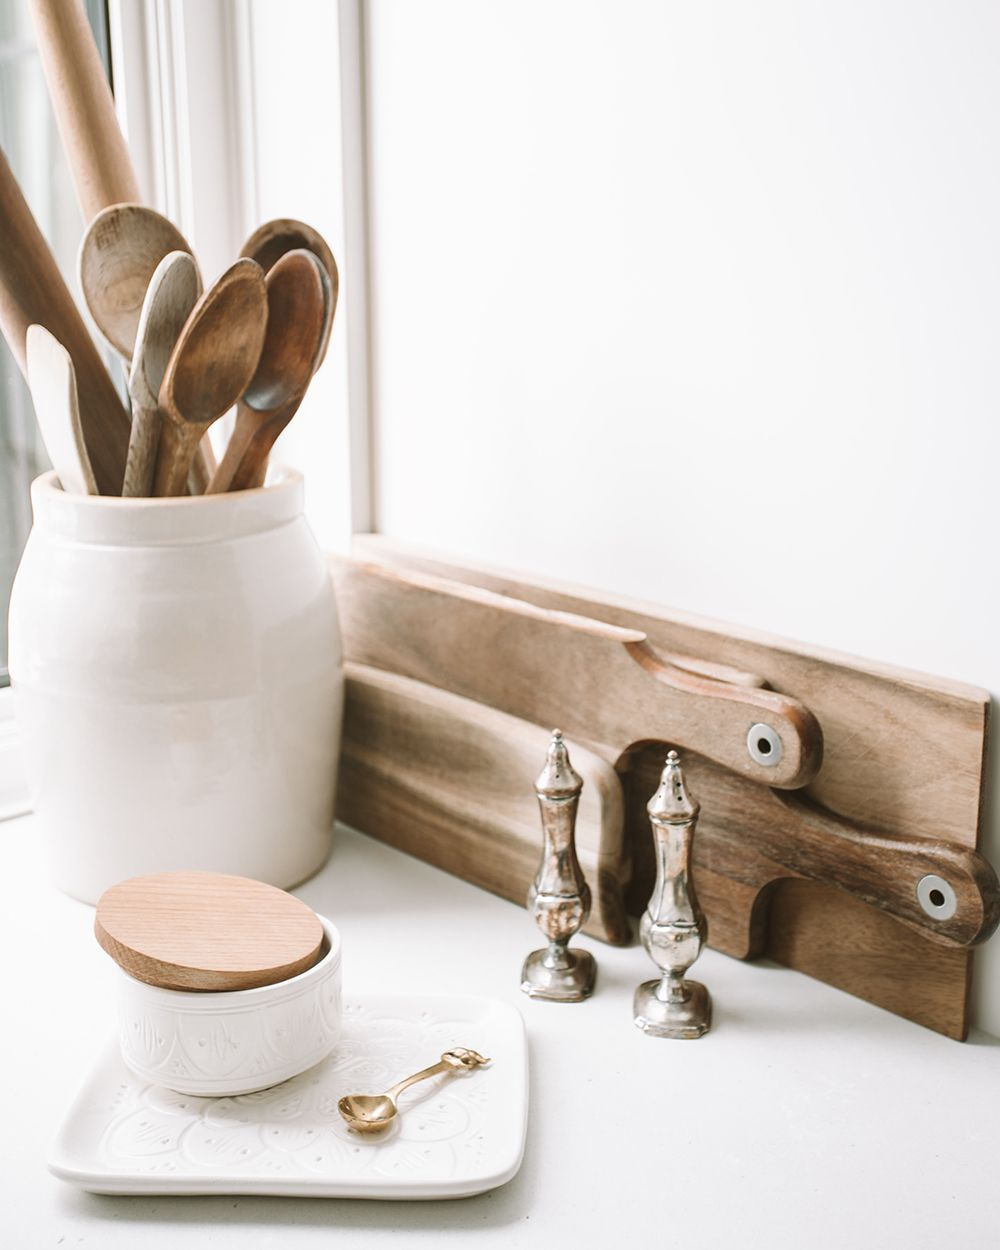 Kitchen_utensils_ryan-christodoulou-68cddj03rks-unsplash_flip